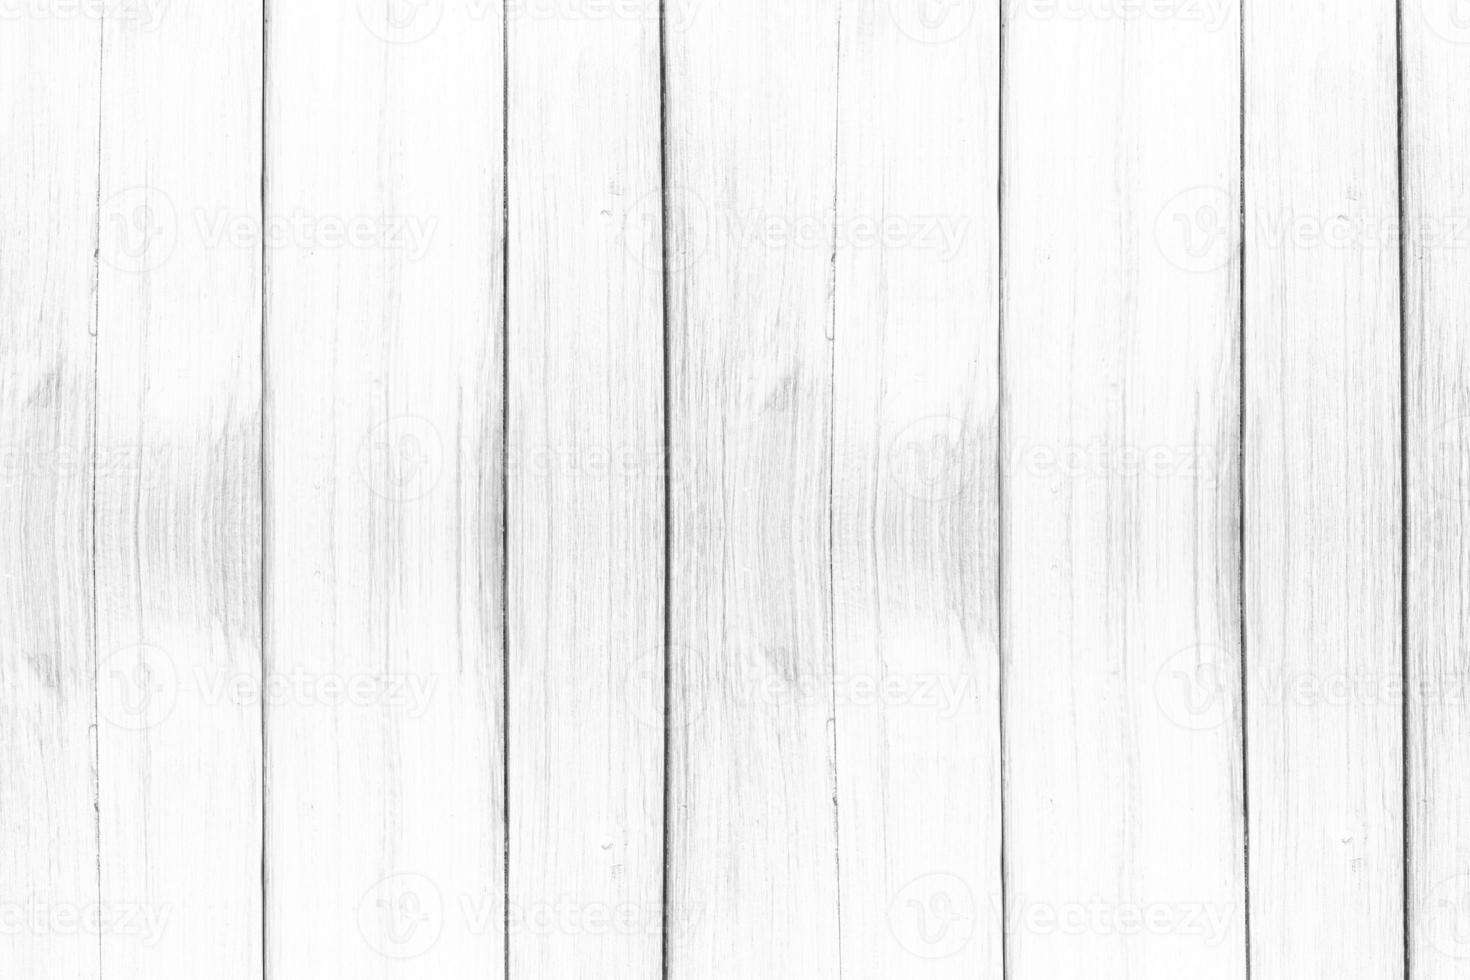 fond bois blanc photo